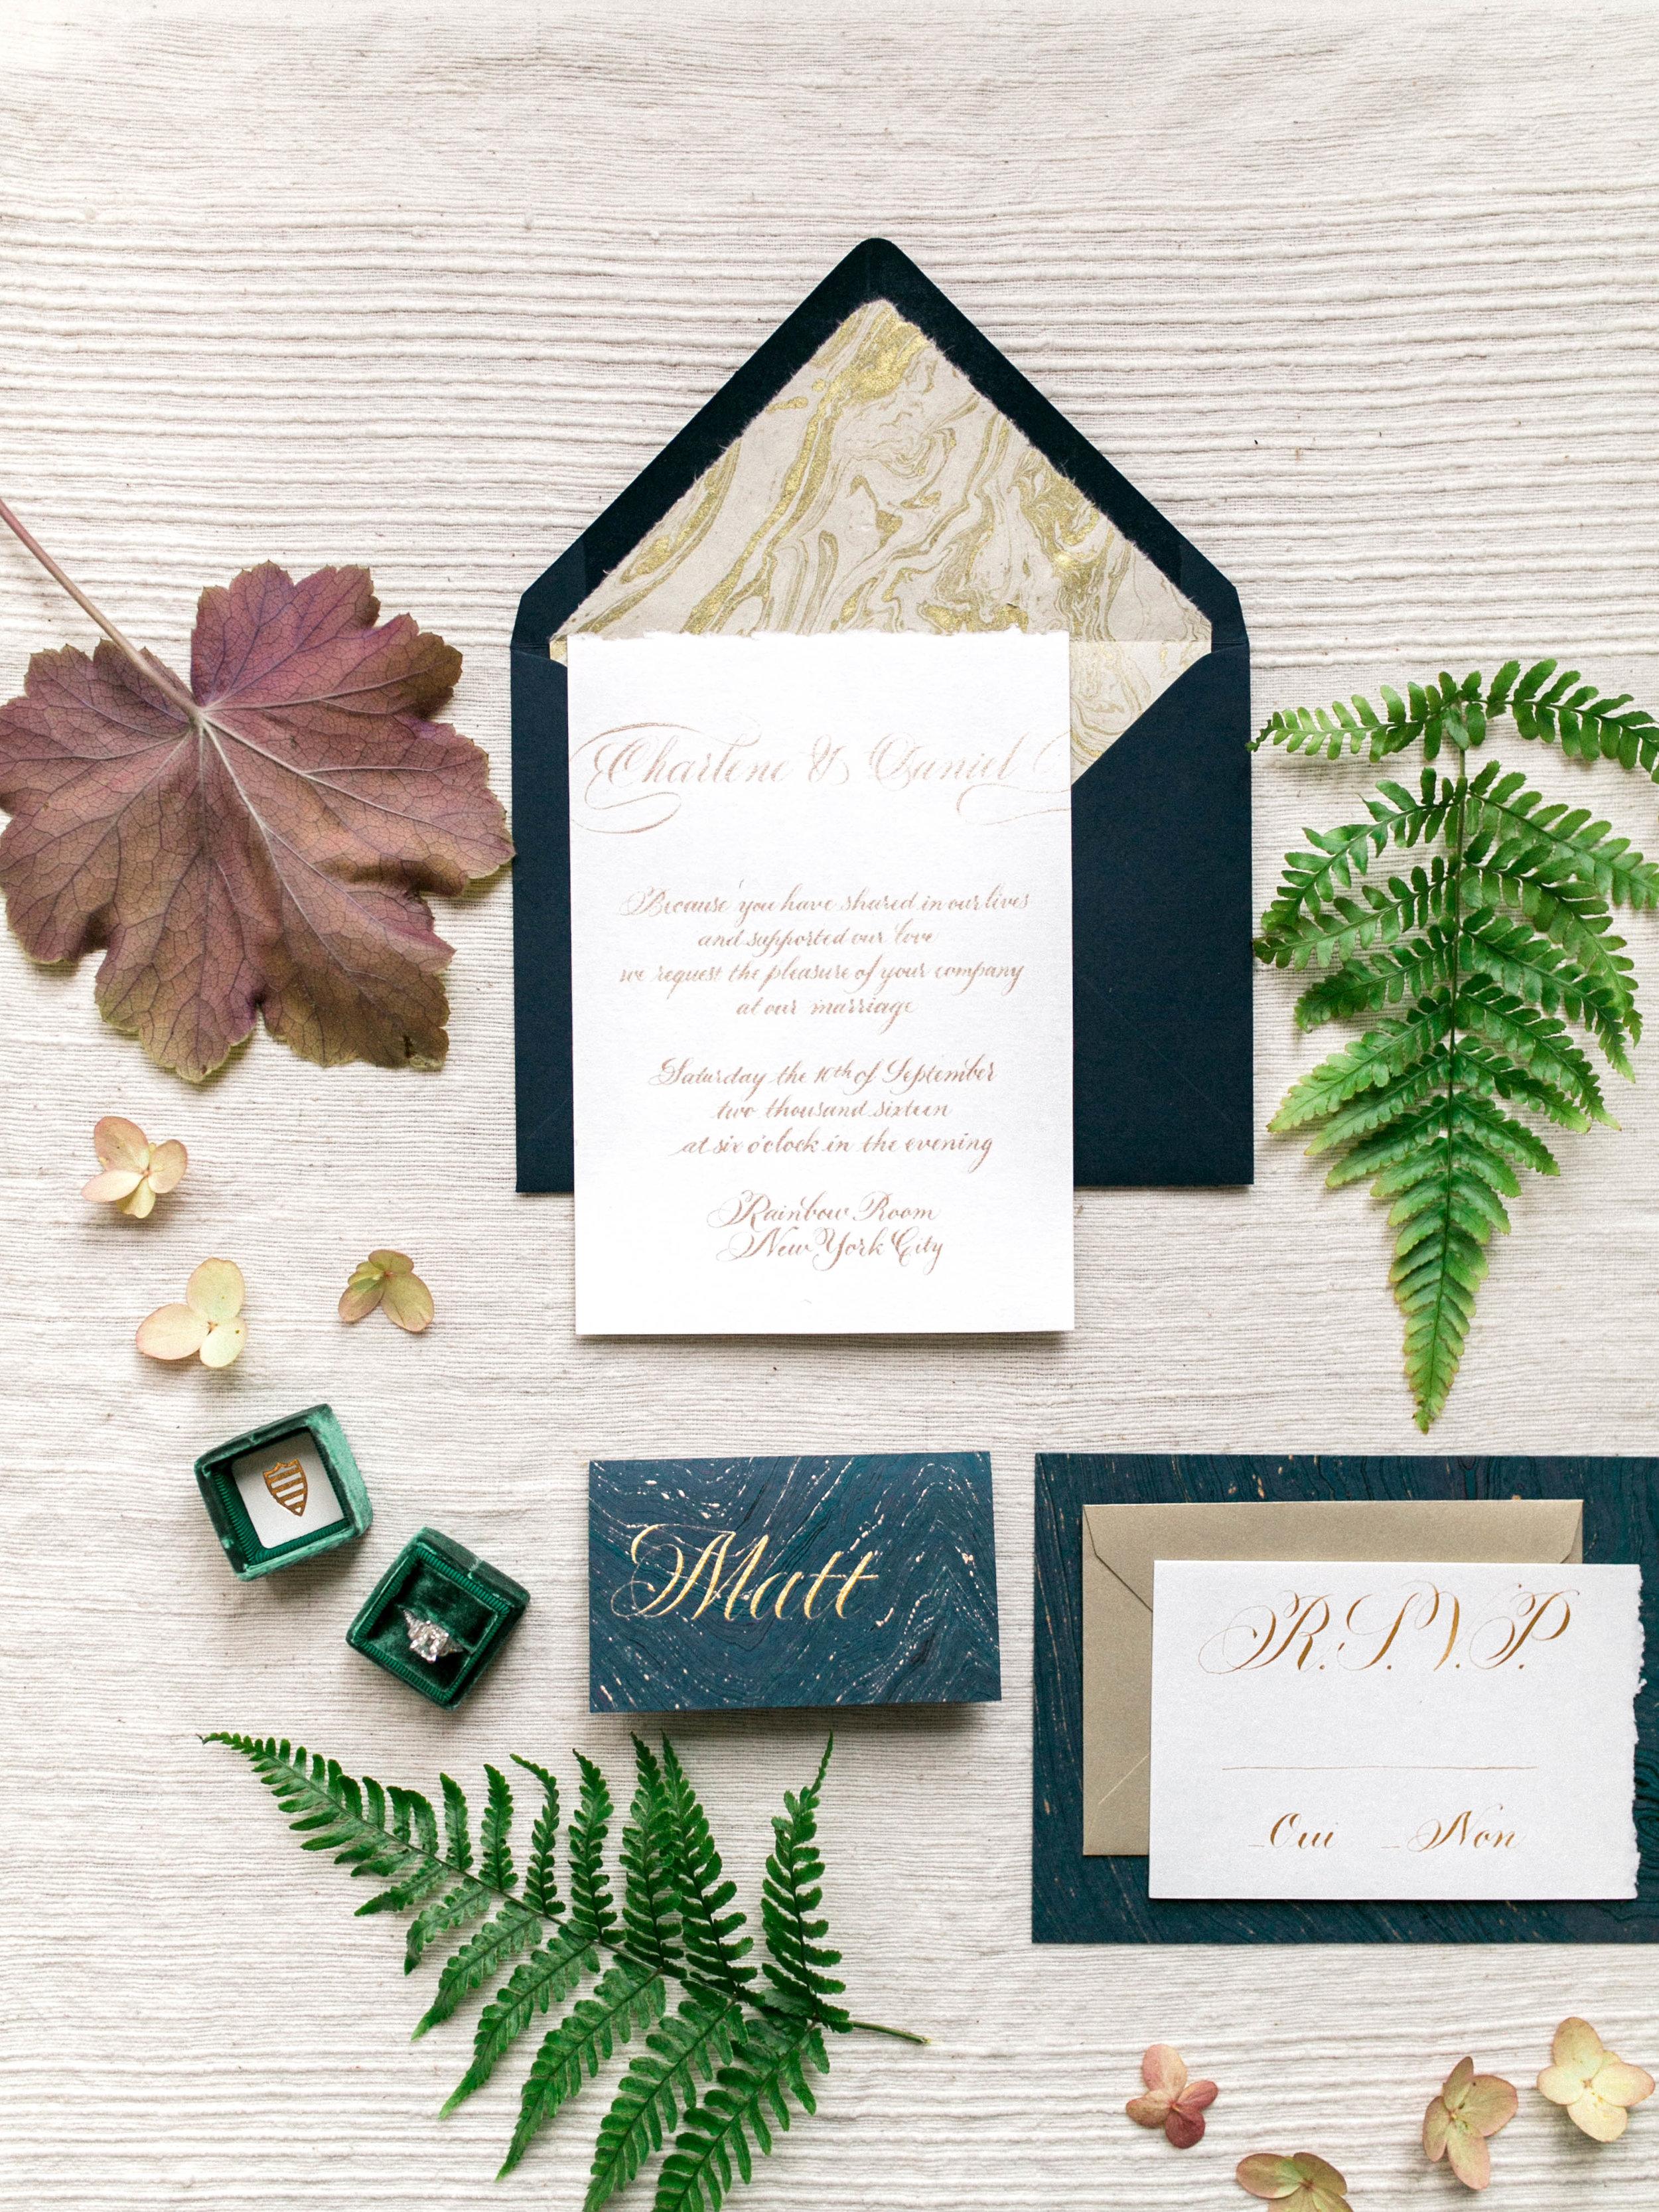 Calligraphy wedding invitation suite | www.chavelli.com